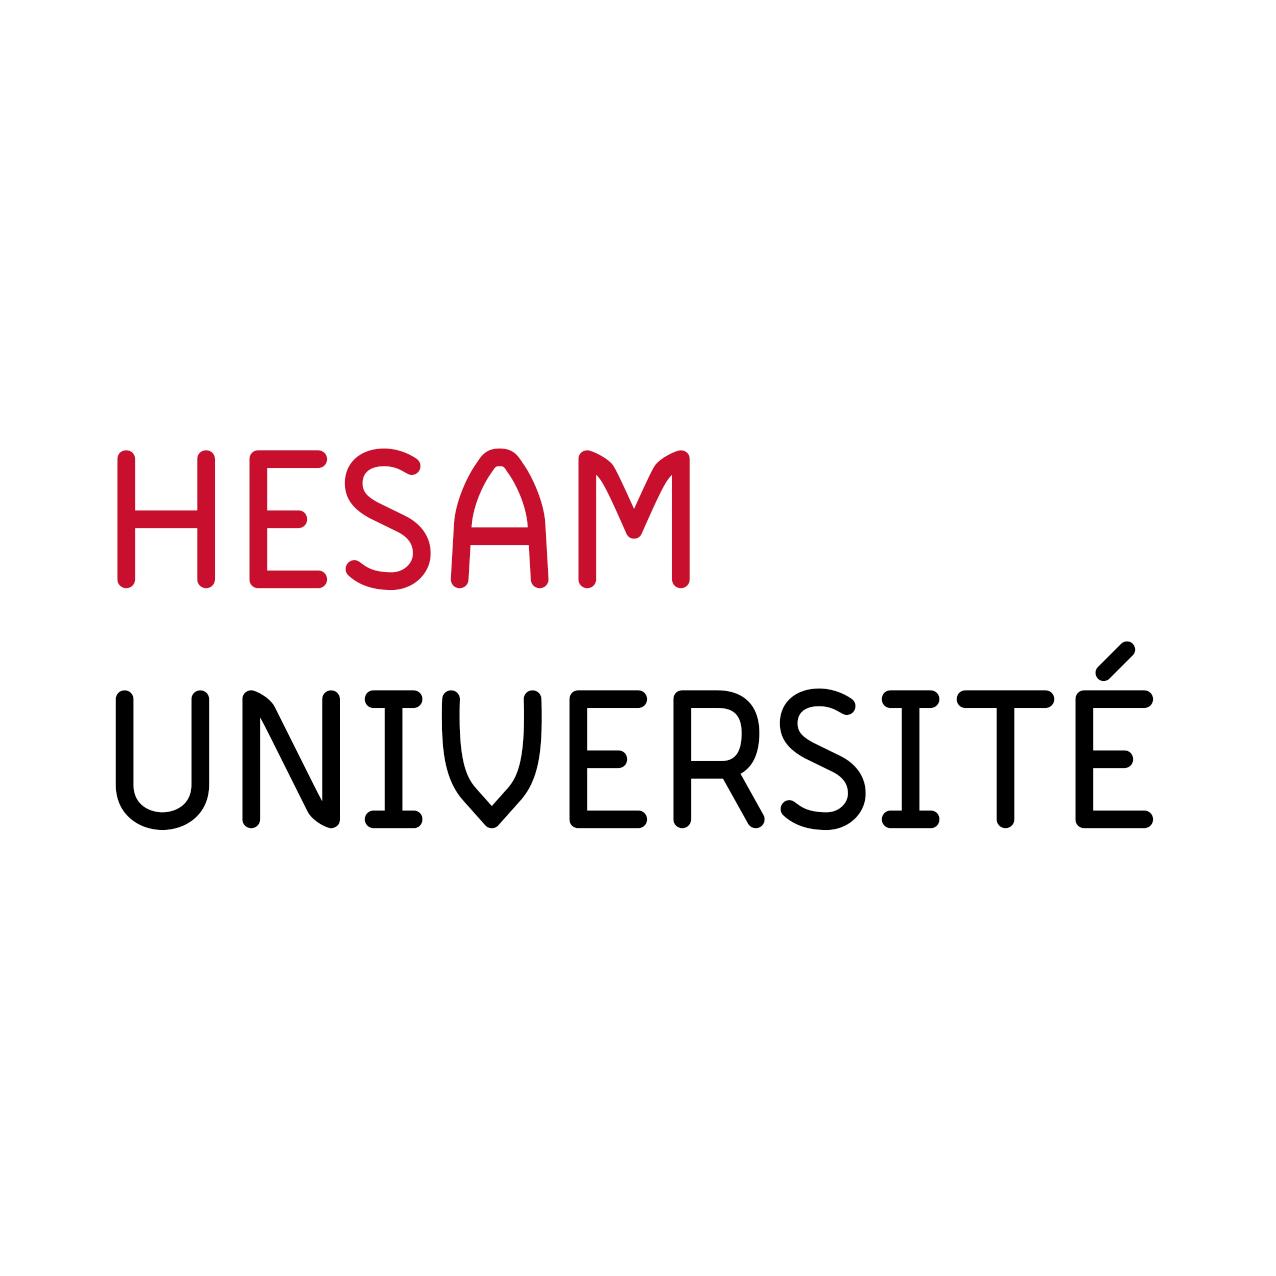 HESAM